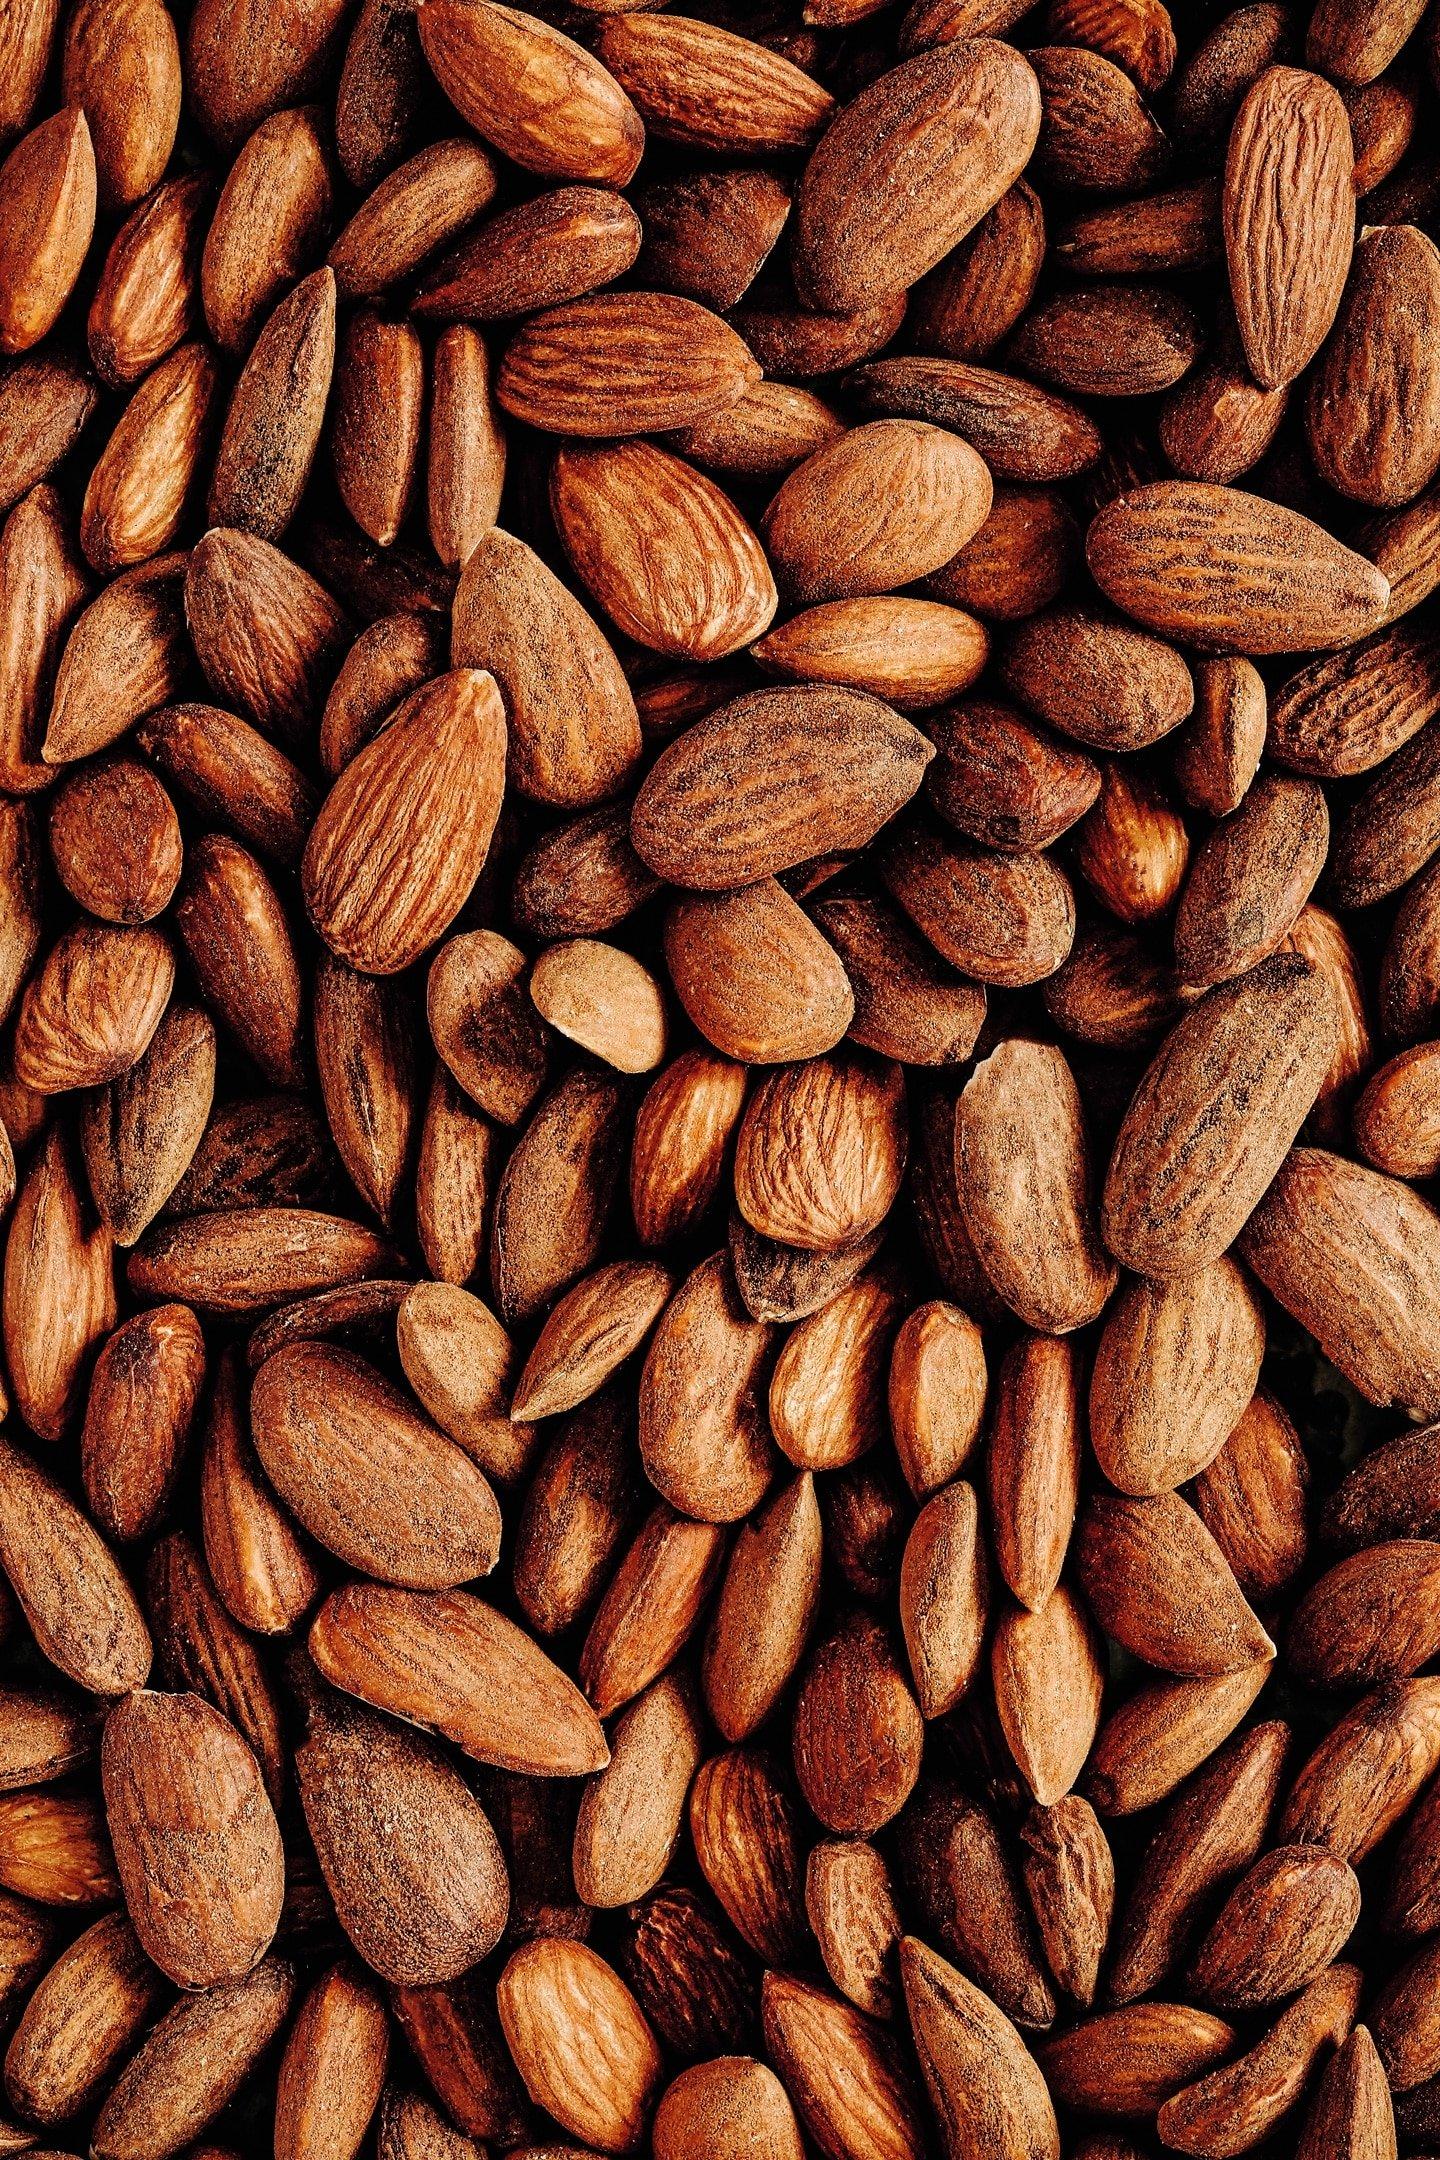 Almond photography